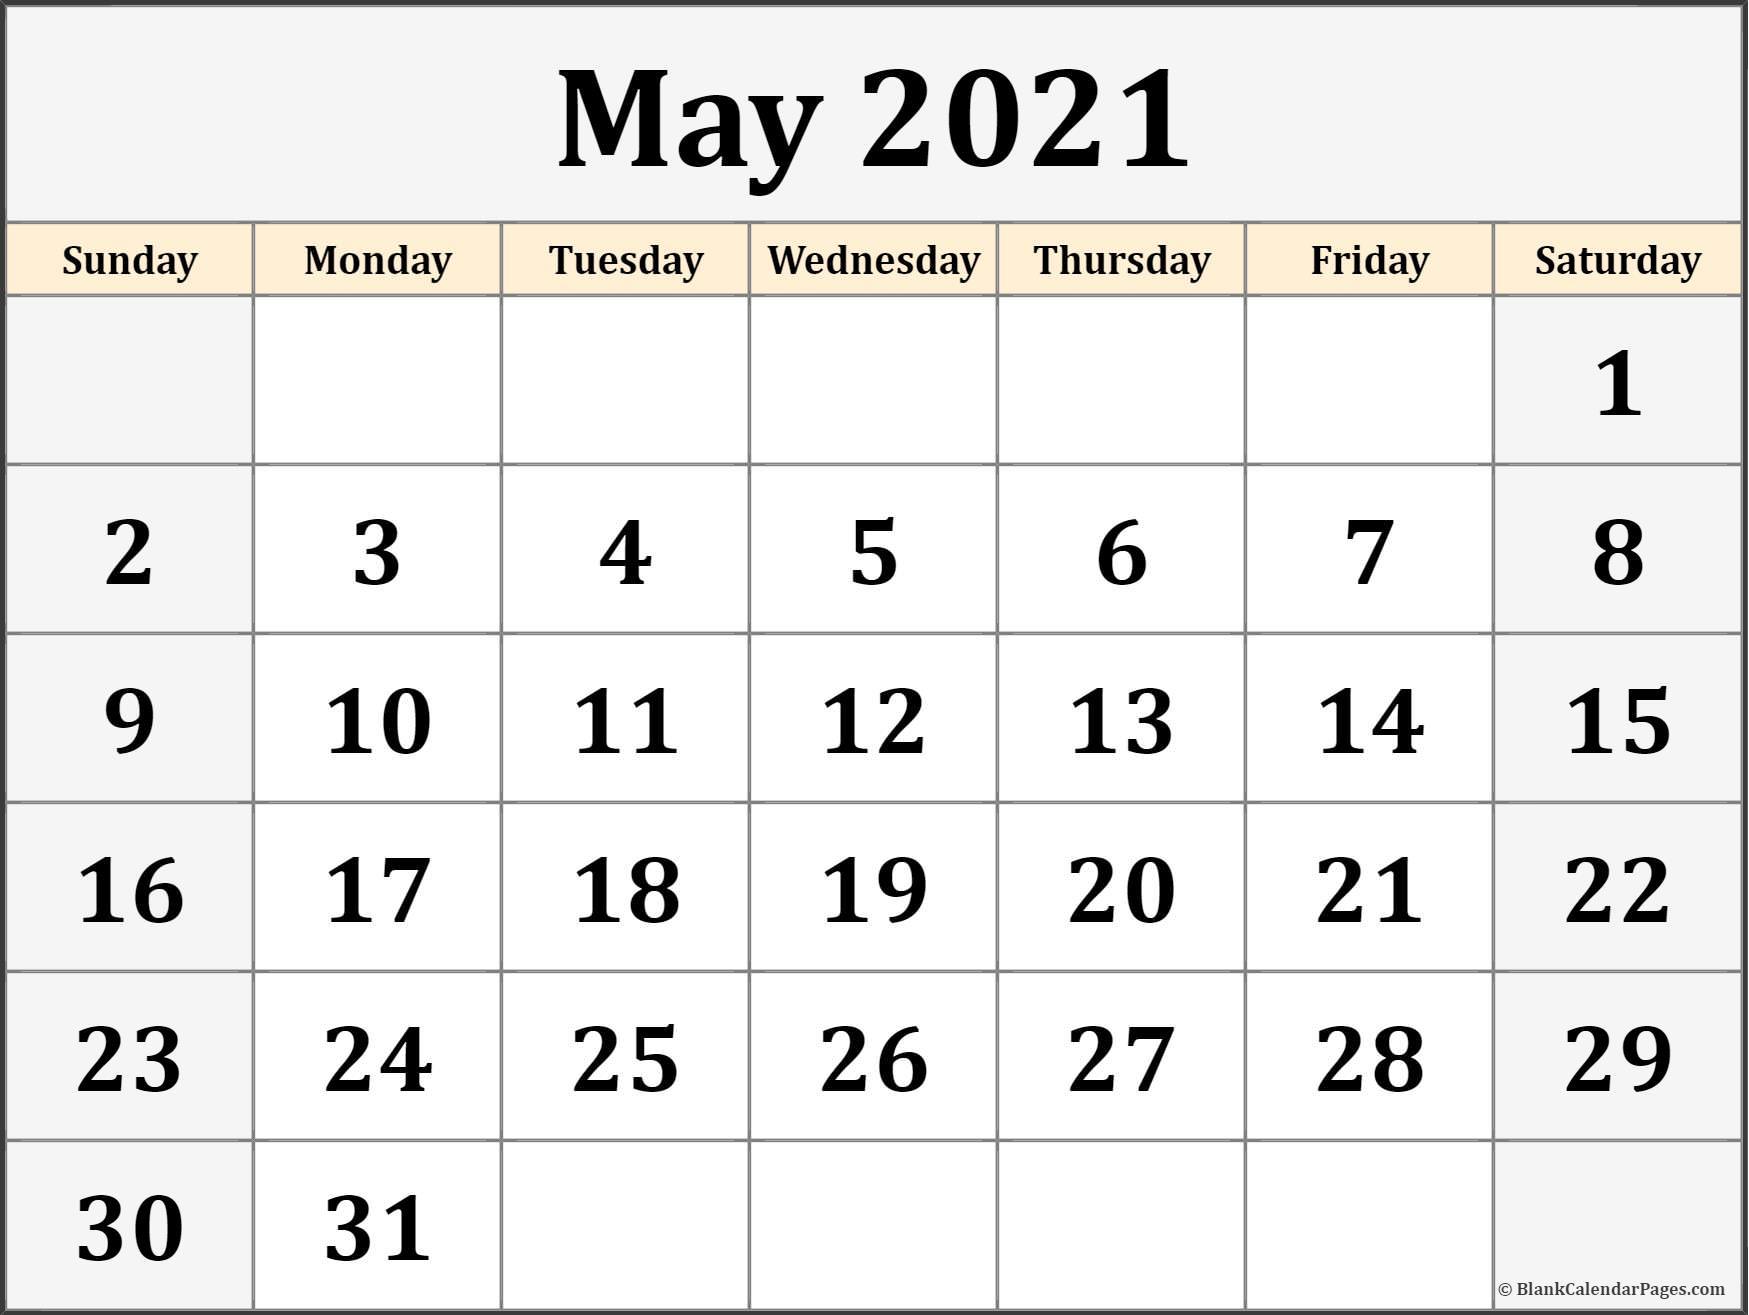 May 2021 Blank Calendar Templates.